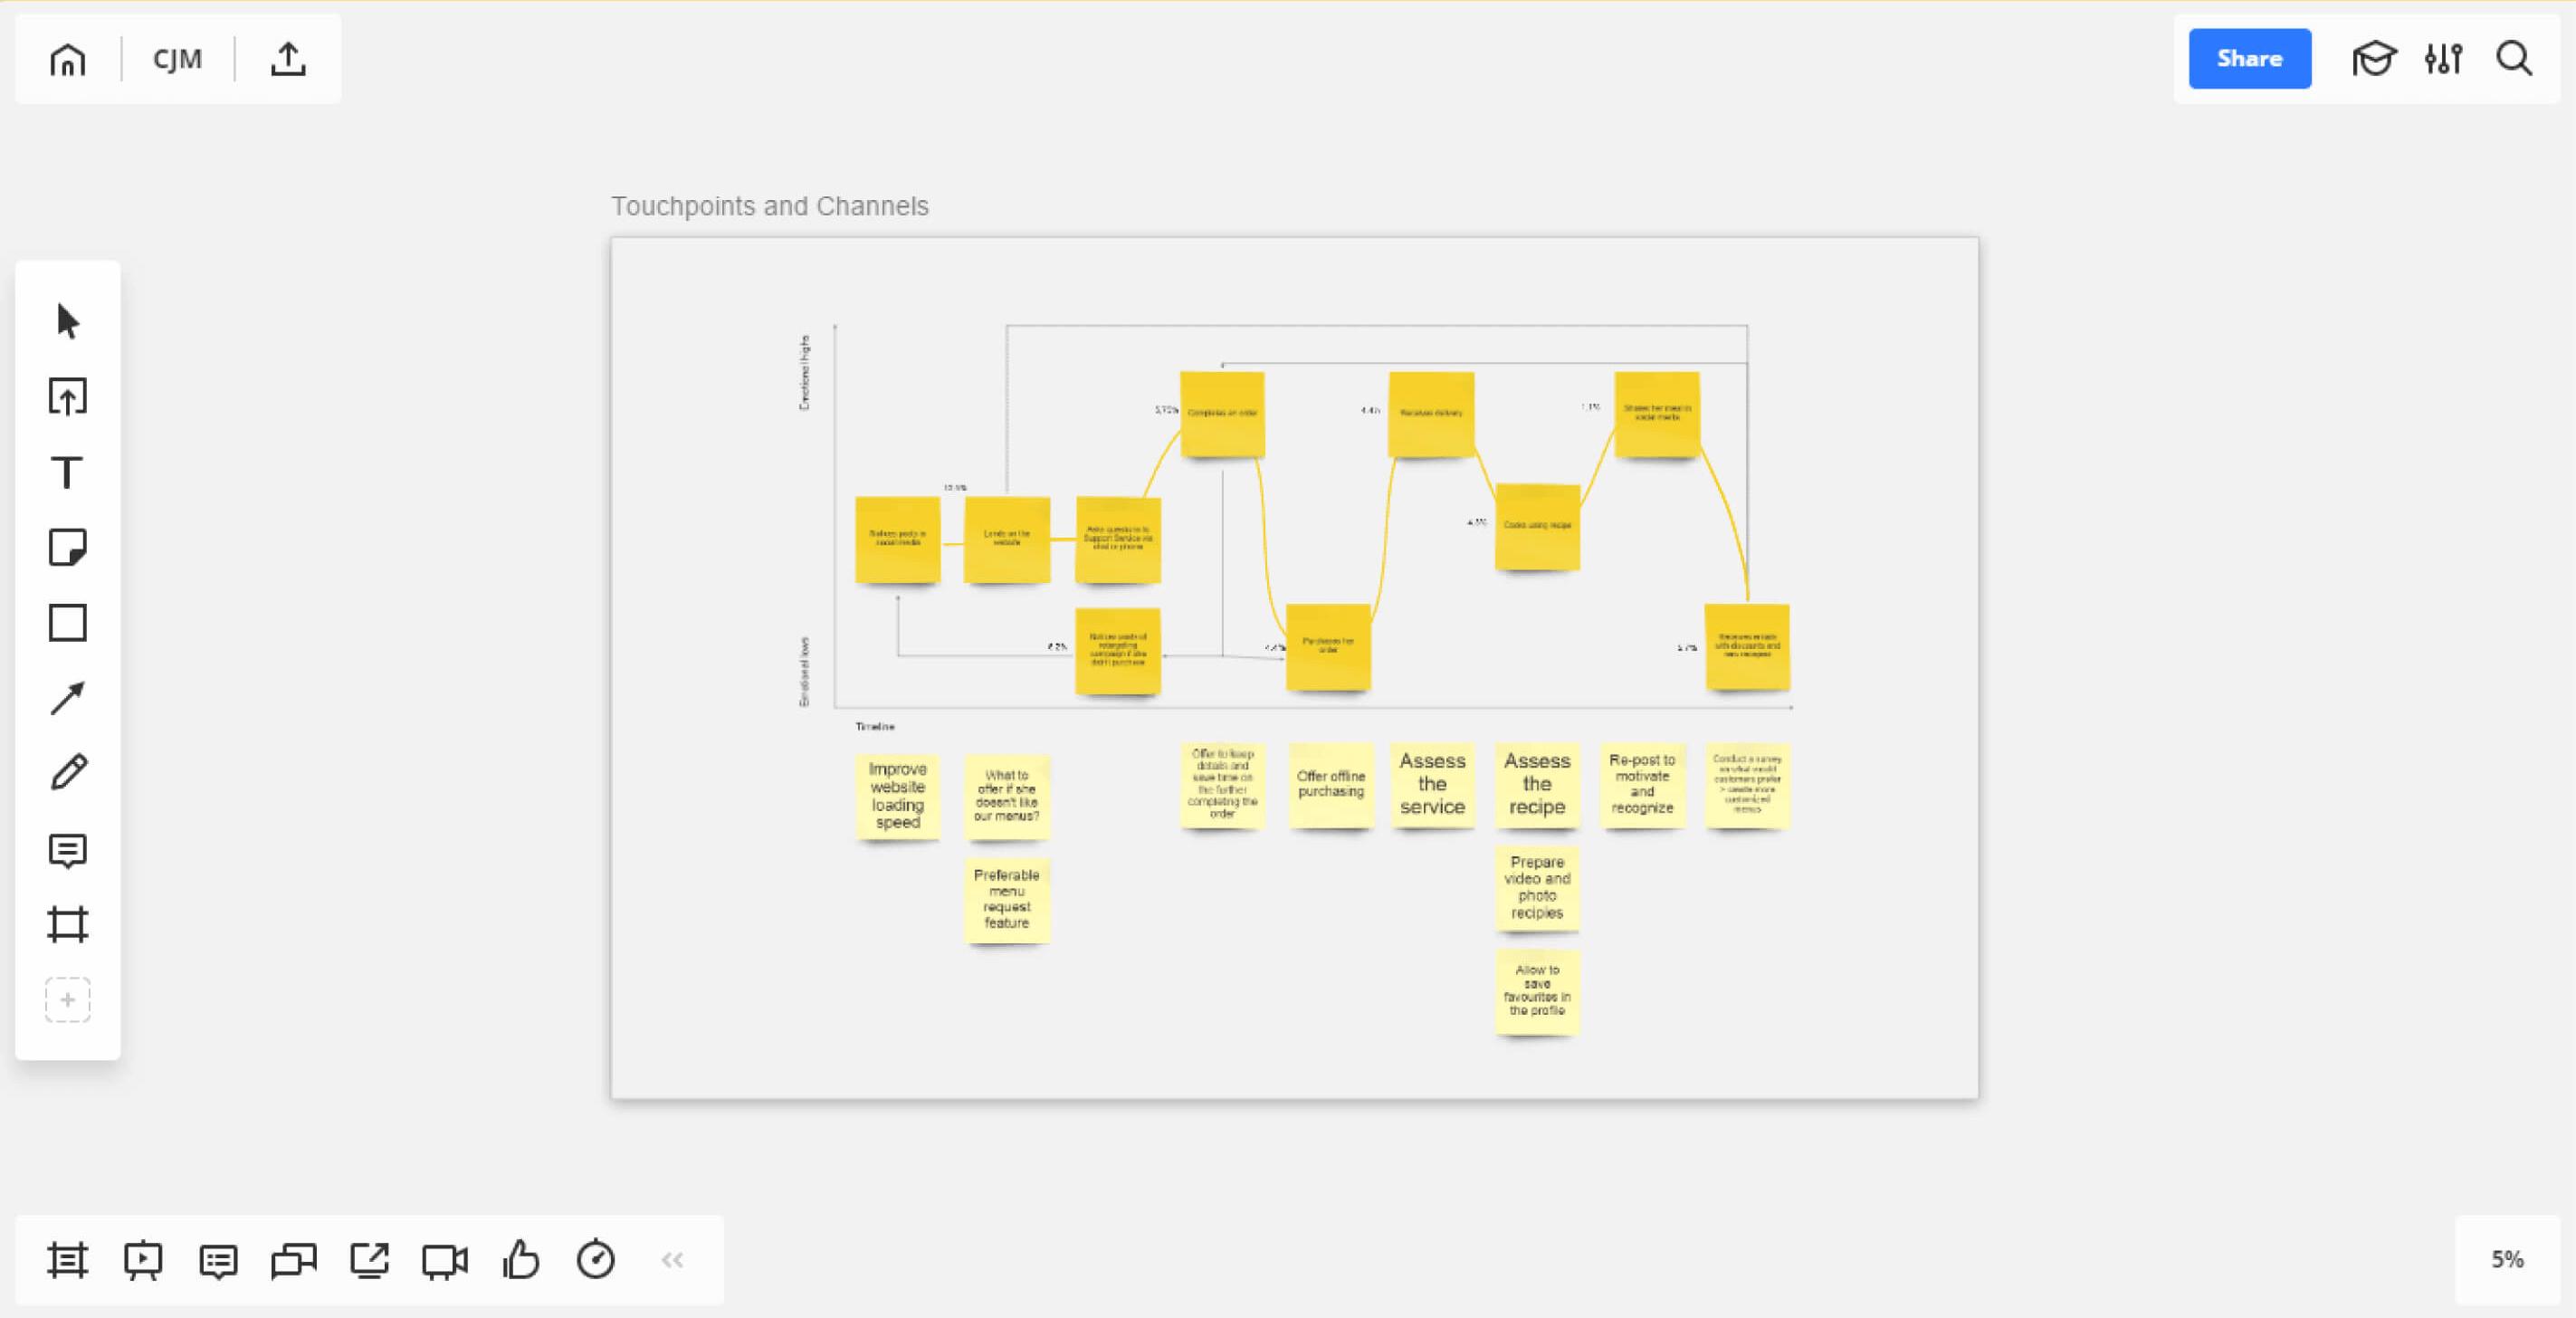 Visual Guide To Customer Journey Mapping Process Schematic Symbols Ux And Cx Pinterest Waaacwaaaaaaqabaeacakqbads